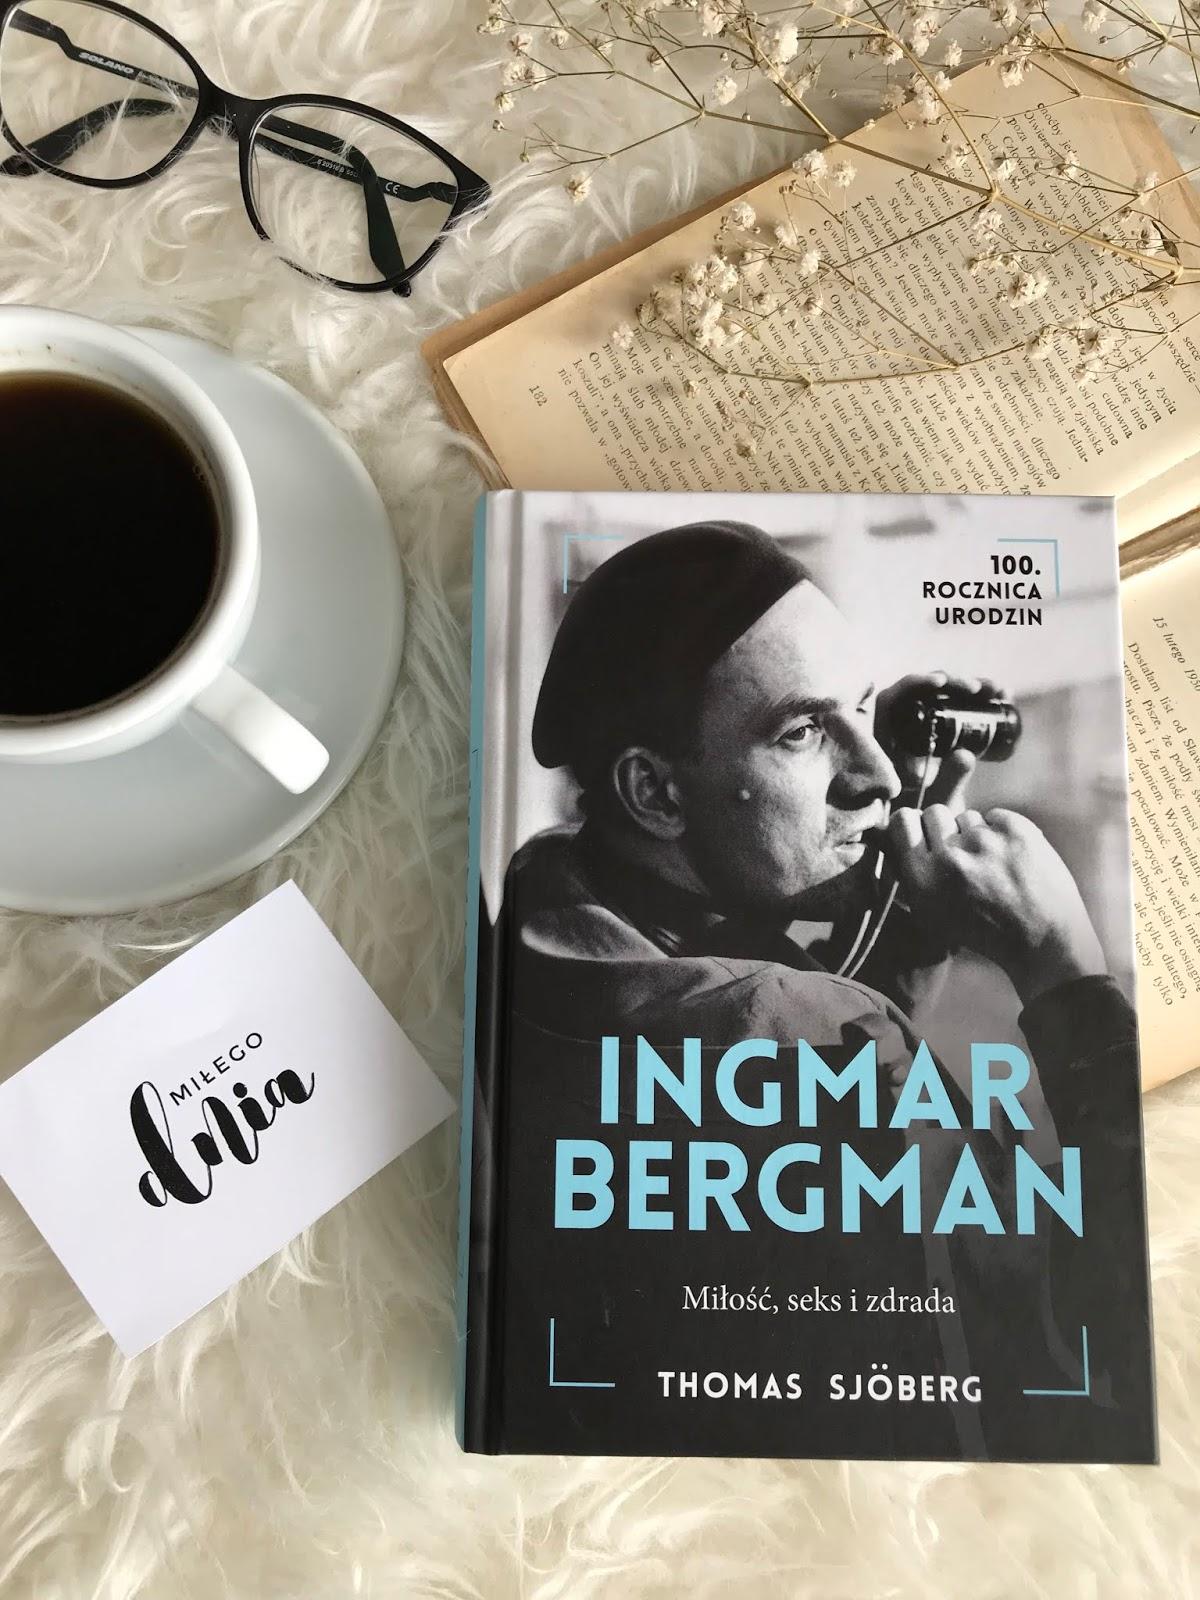 Thomas Sjoberg, Ingmar Bergman. Miłość, seks i zdrada